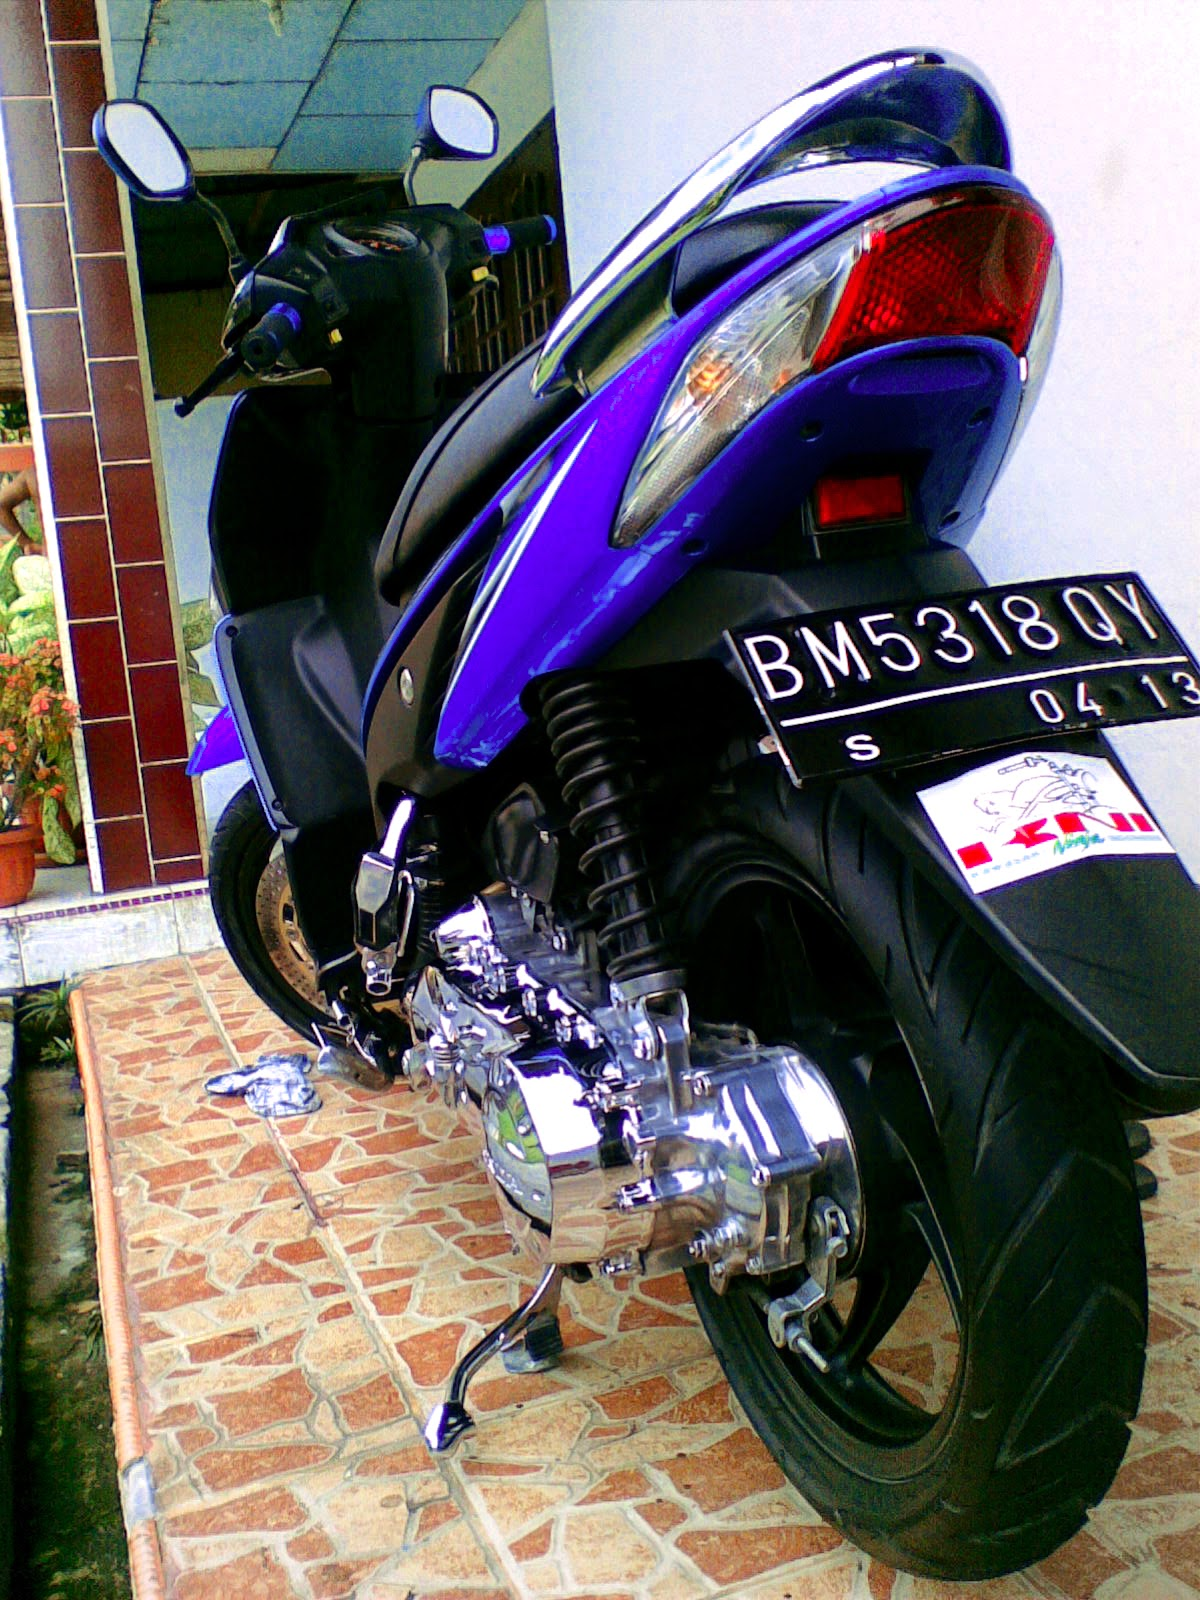 Kumpulan Foto Modifikasi Motor Vario Techno Terlengkap Modispik Motor